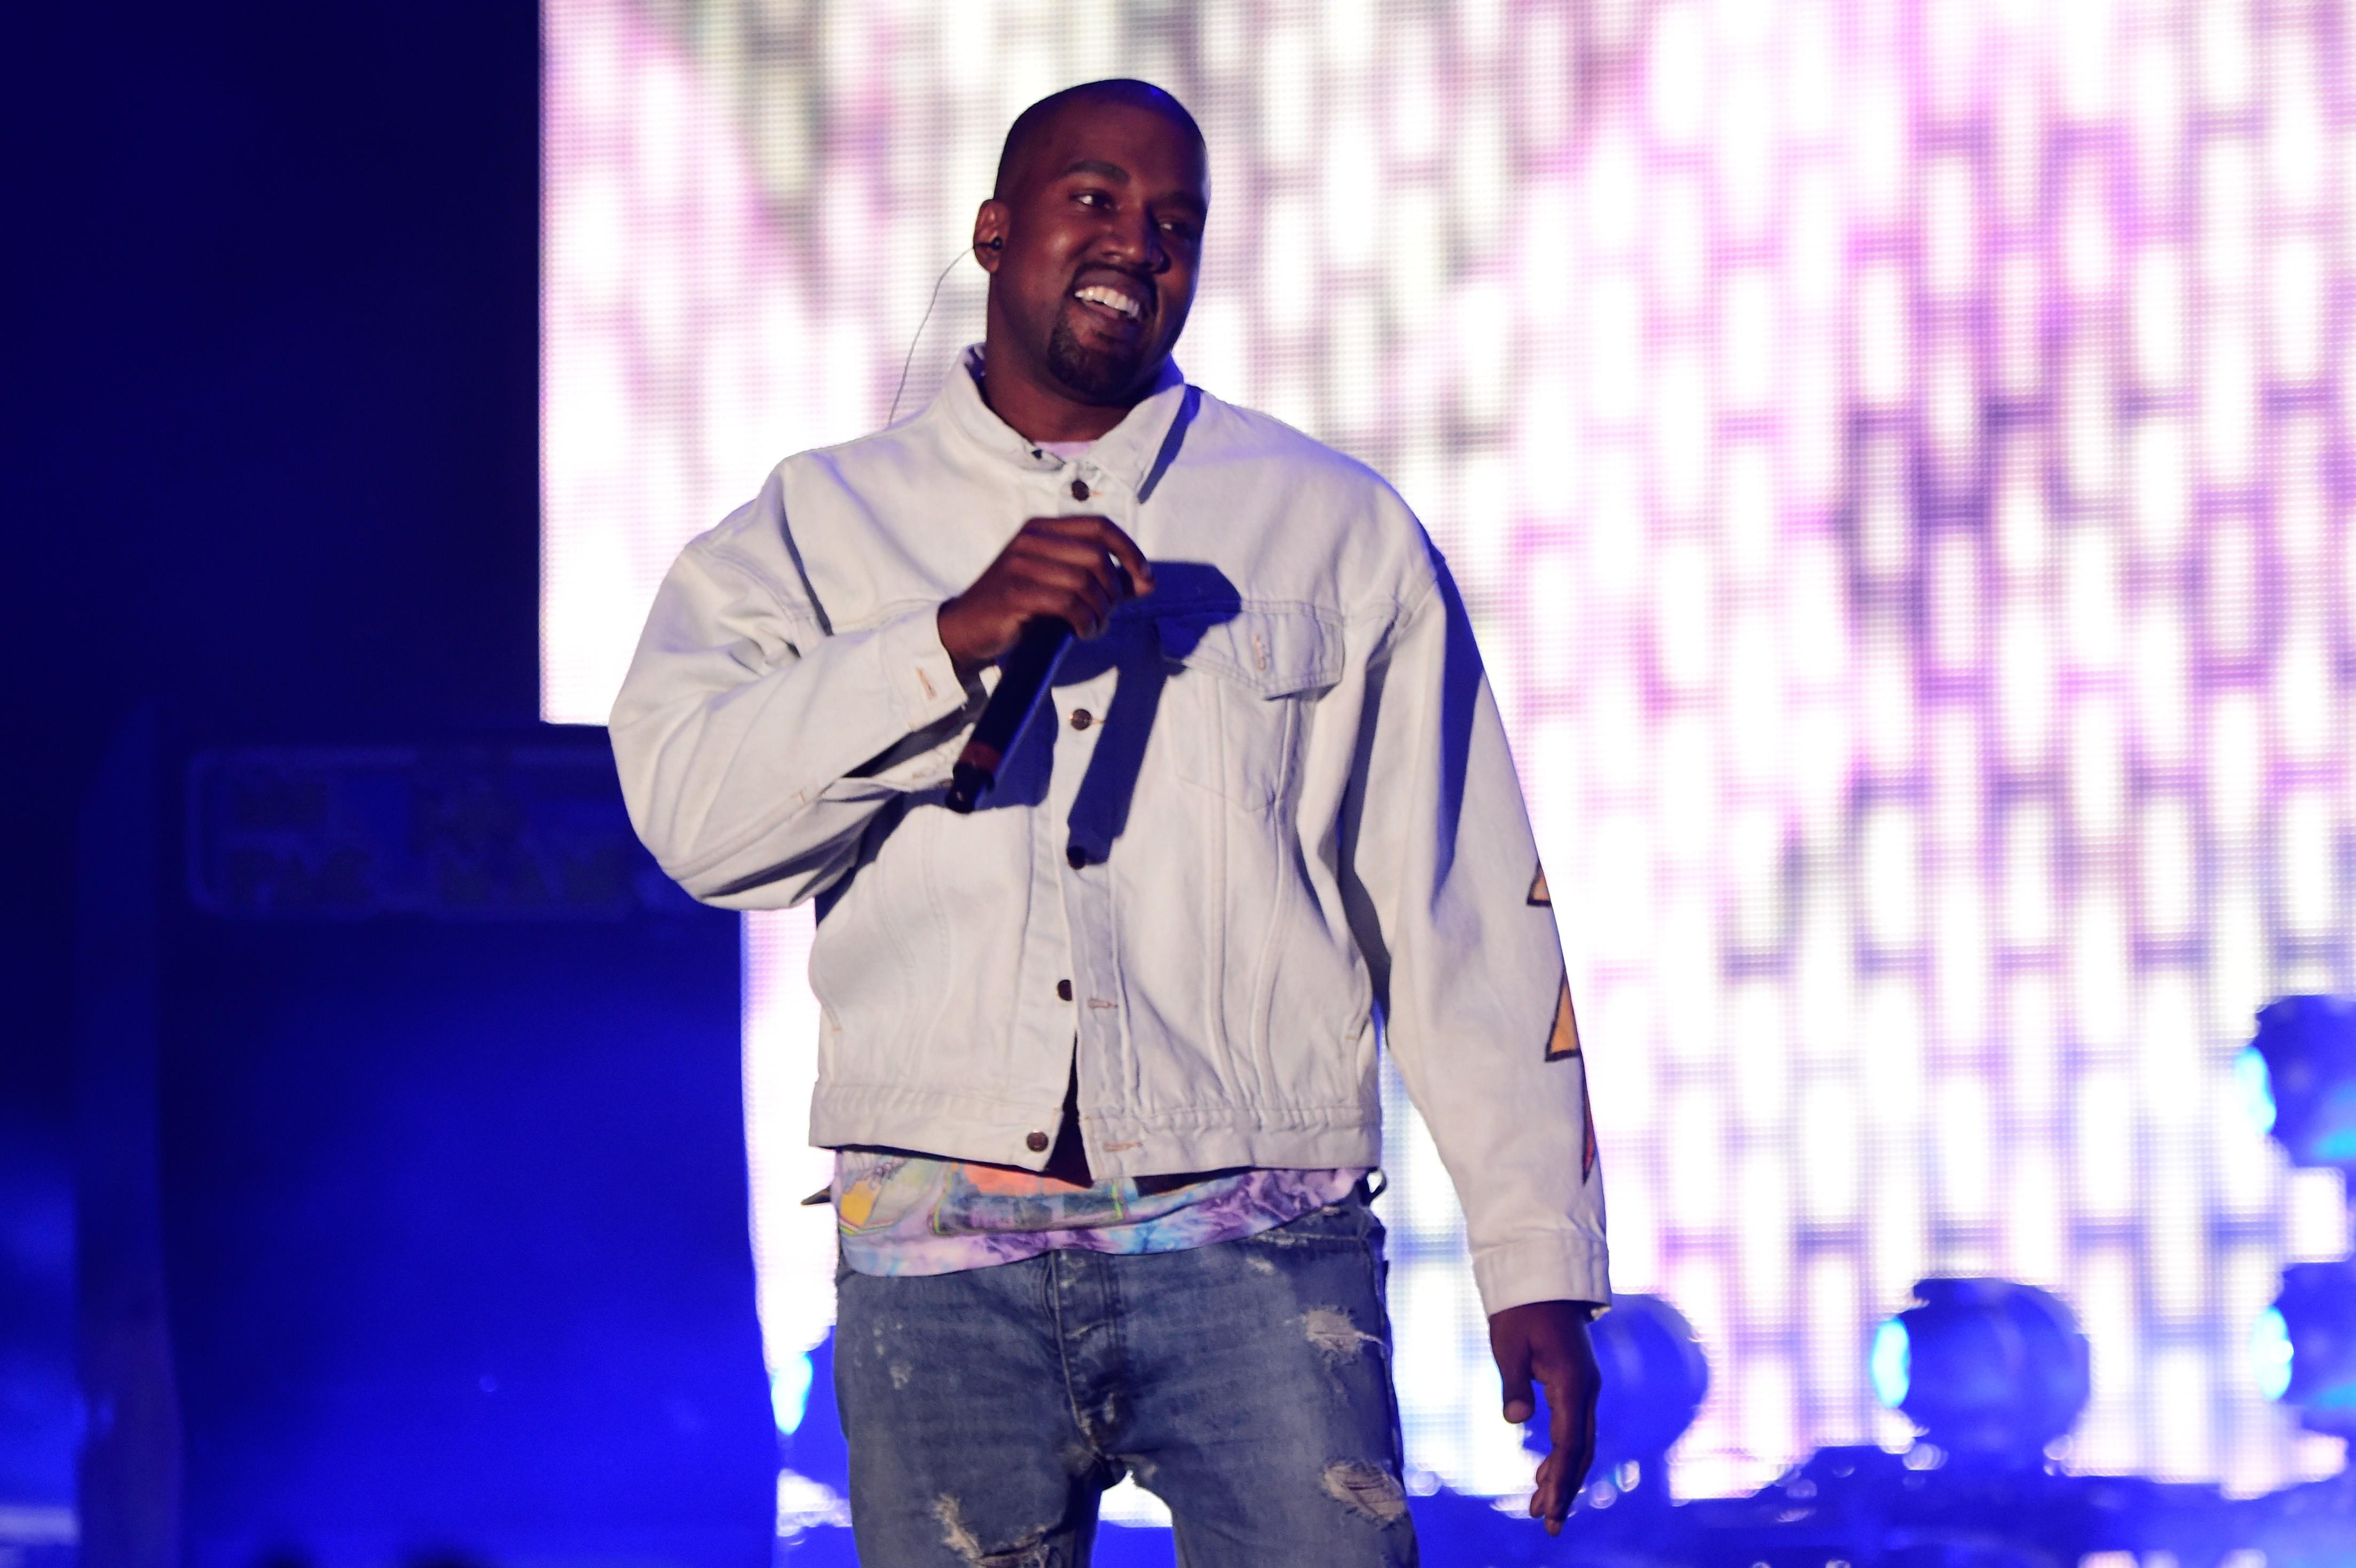 Kanye West Diamond Cross wyoming ranch